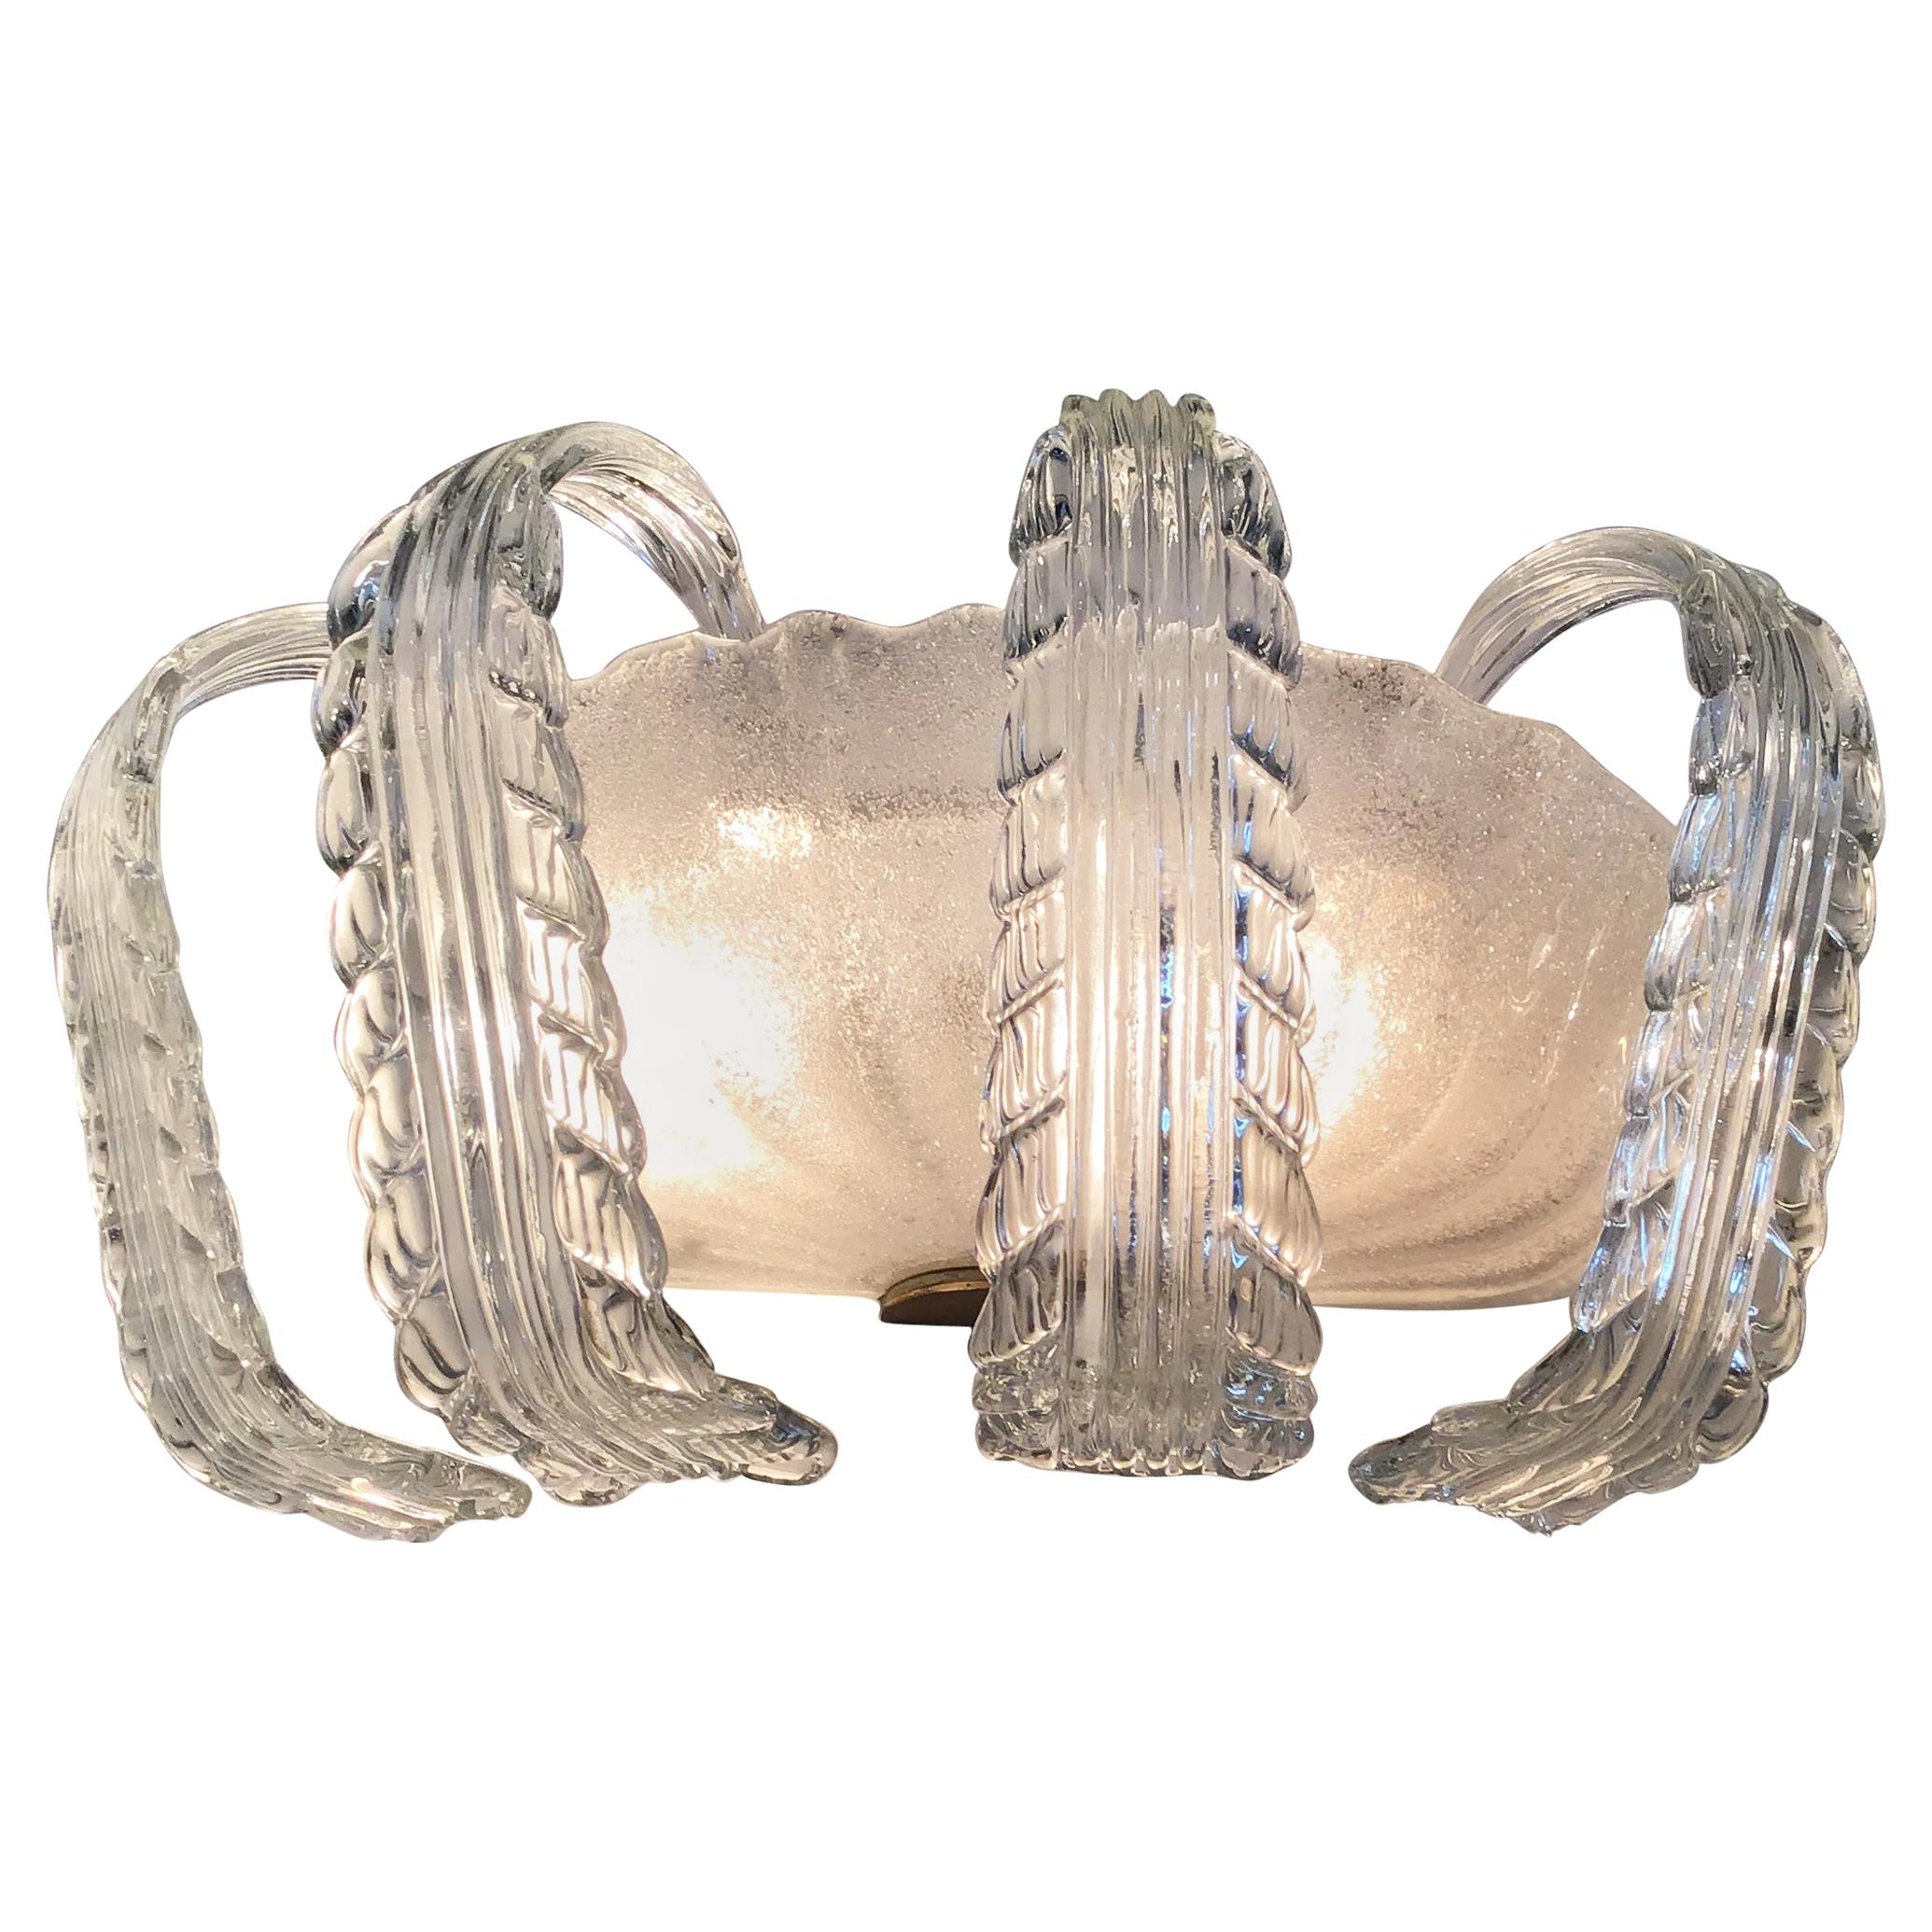 Barovier e Toso Sconces Murano Glass Brass, 1940, Italy